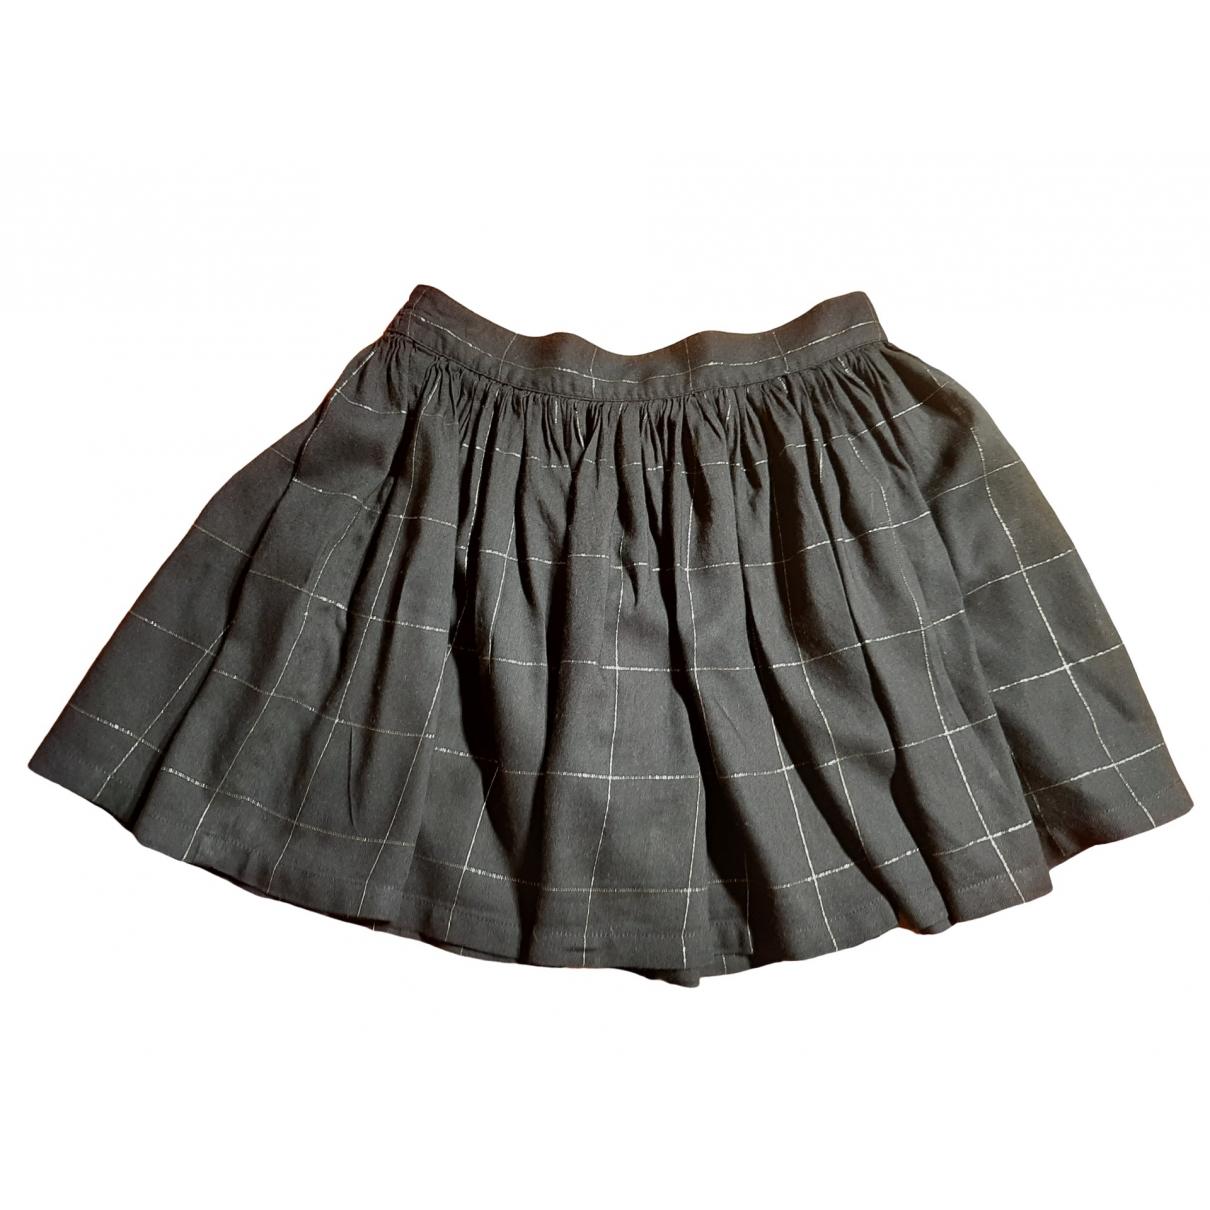 Bonton \N Black Cotton skirt for Kids 10 years - up to 142cm FR